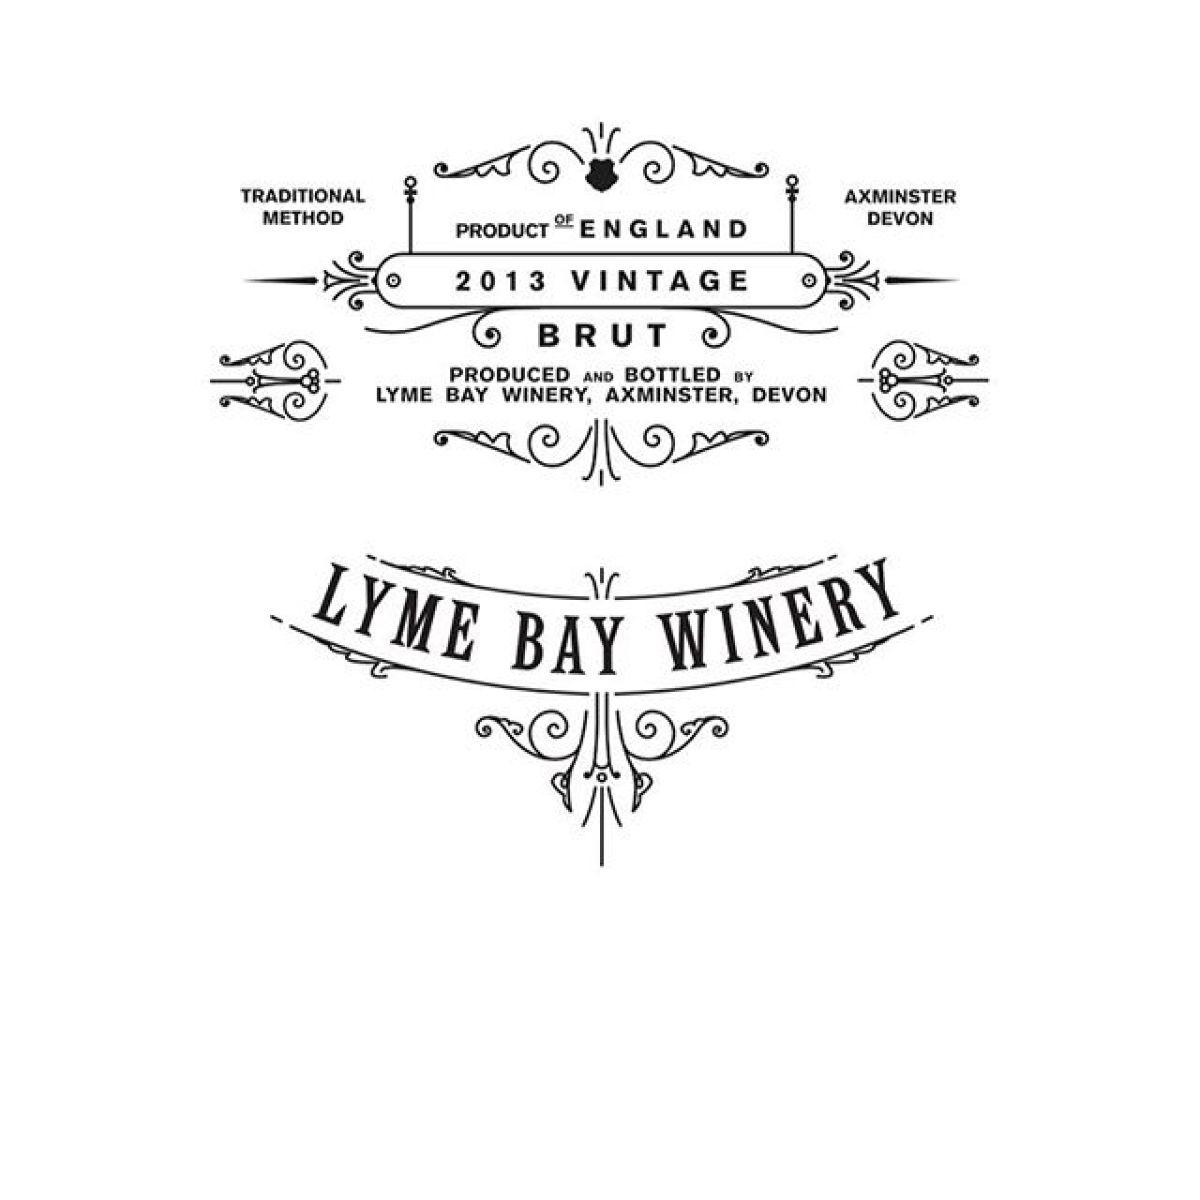 From The Archive — Development Work.@lymebaywinery.#englishsparklingwine #drawing #packaging #packagingdesign #labeldesign #branding #graphicdesign #label #foil #deboss #wine #winetasting #wines #englishwine #vintage #vinyards #winenot #winelife #england #British #markers #art #sparklingwine #christmas #festive